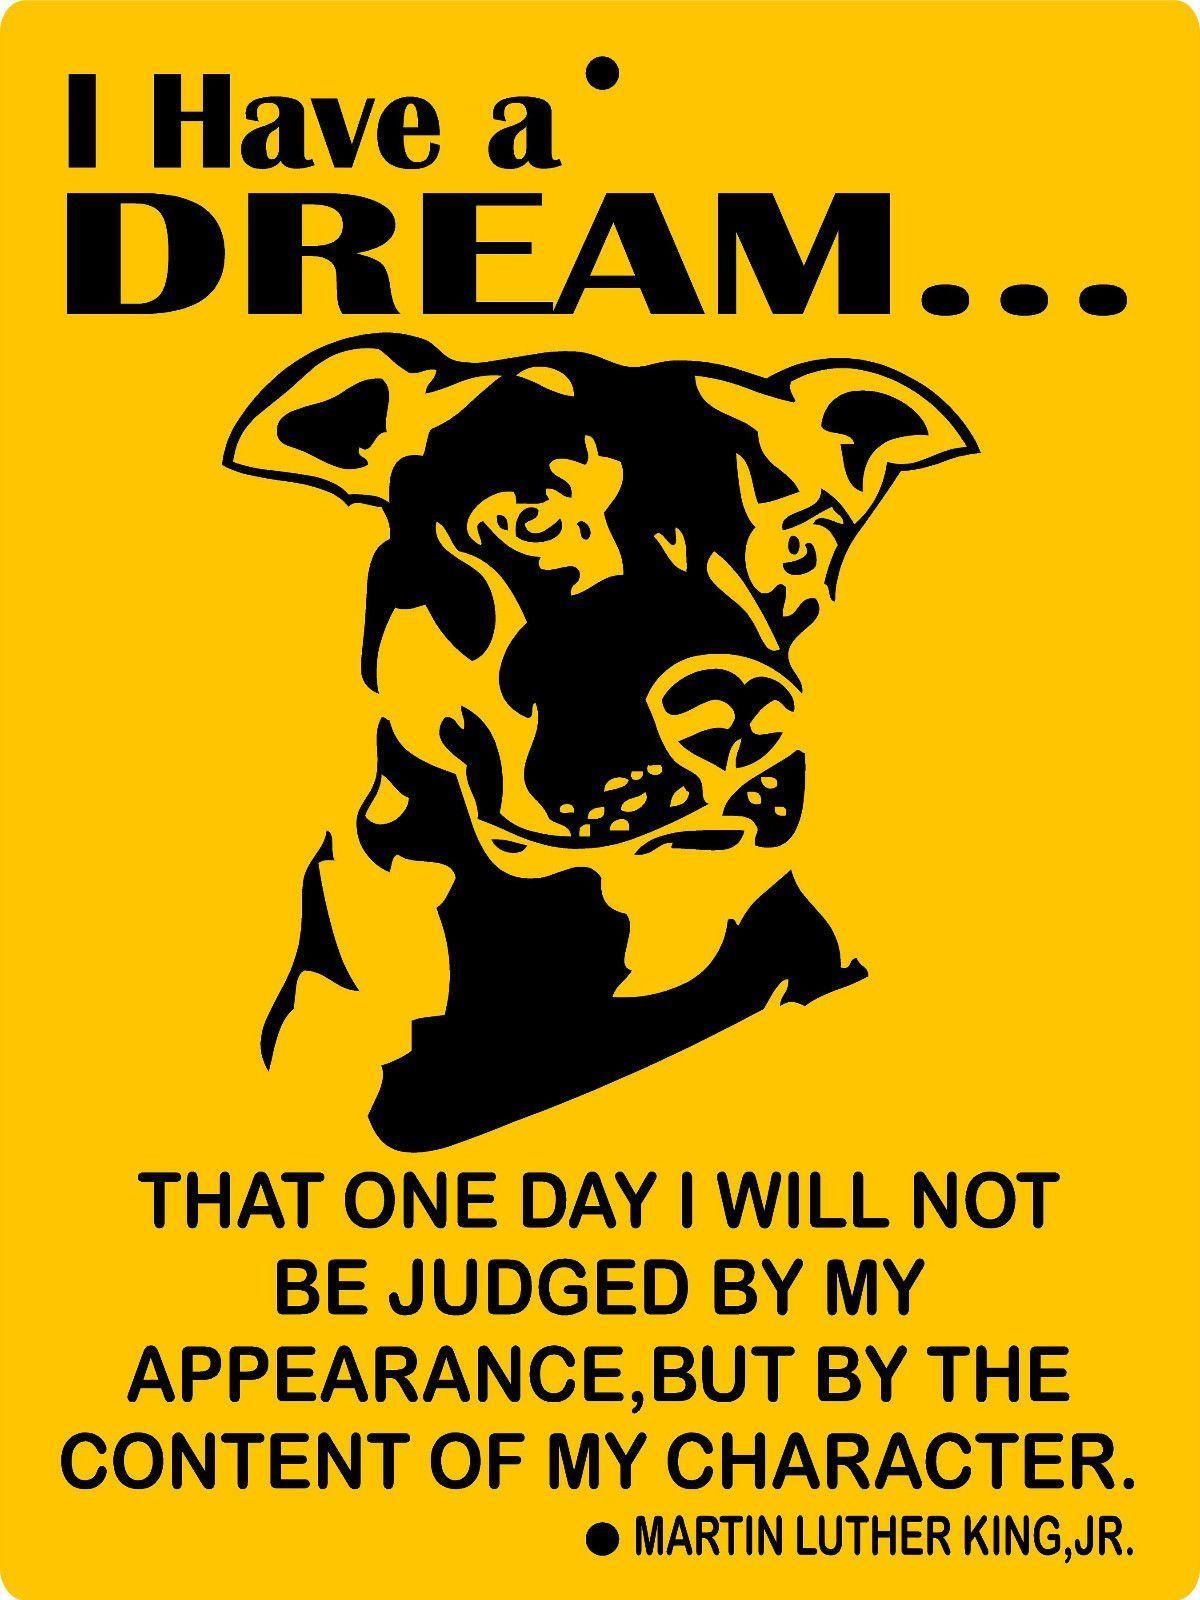 Pitbull, pit bull, aluminum dog signs ihad1 | Pit bull, Dog and Animal